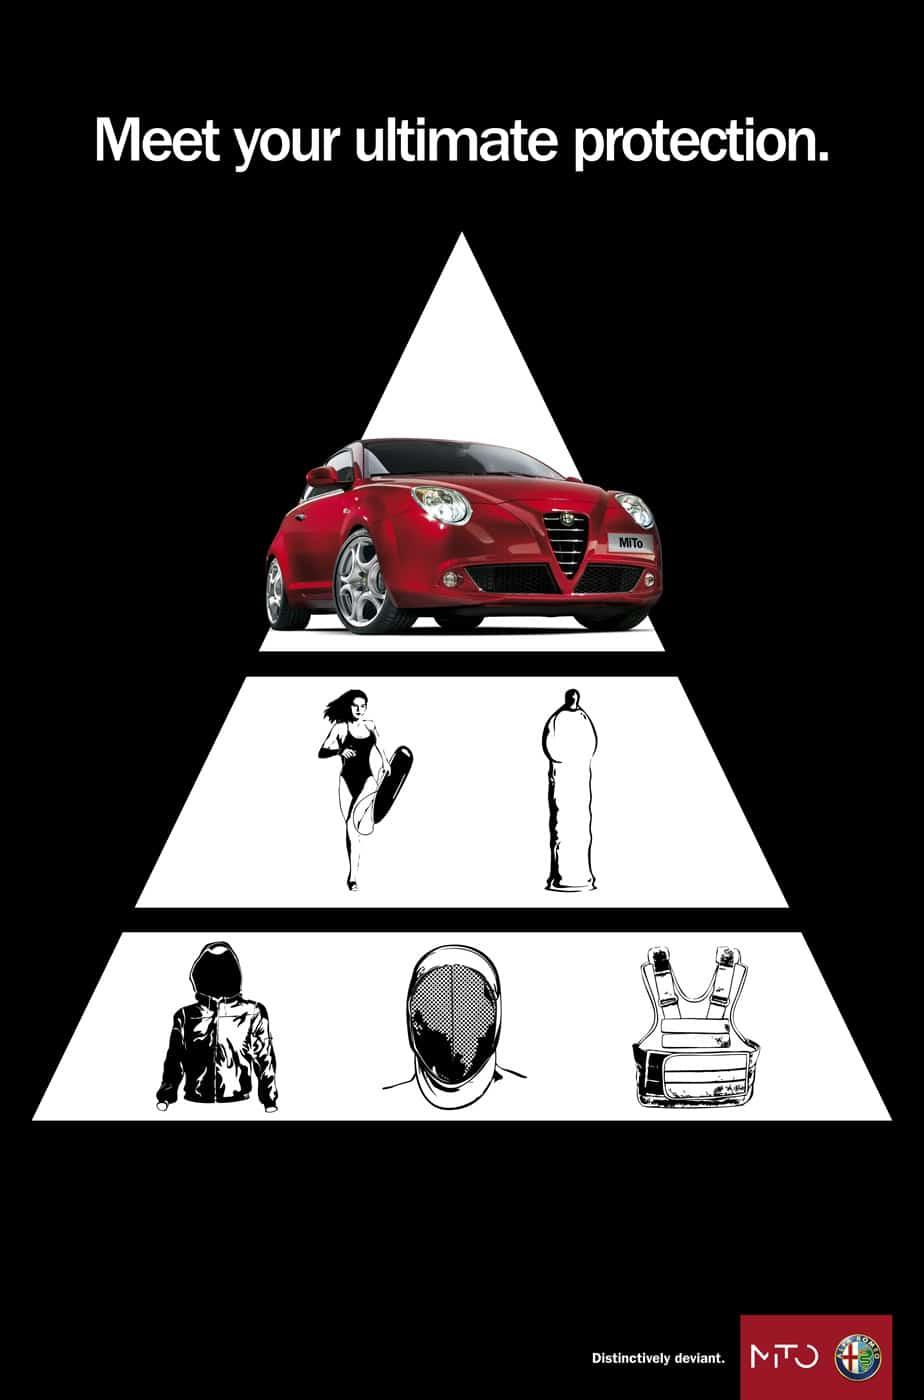 Alfa_Romeo_Deviant-Protection_RGB_1